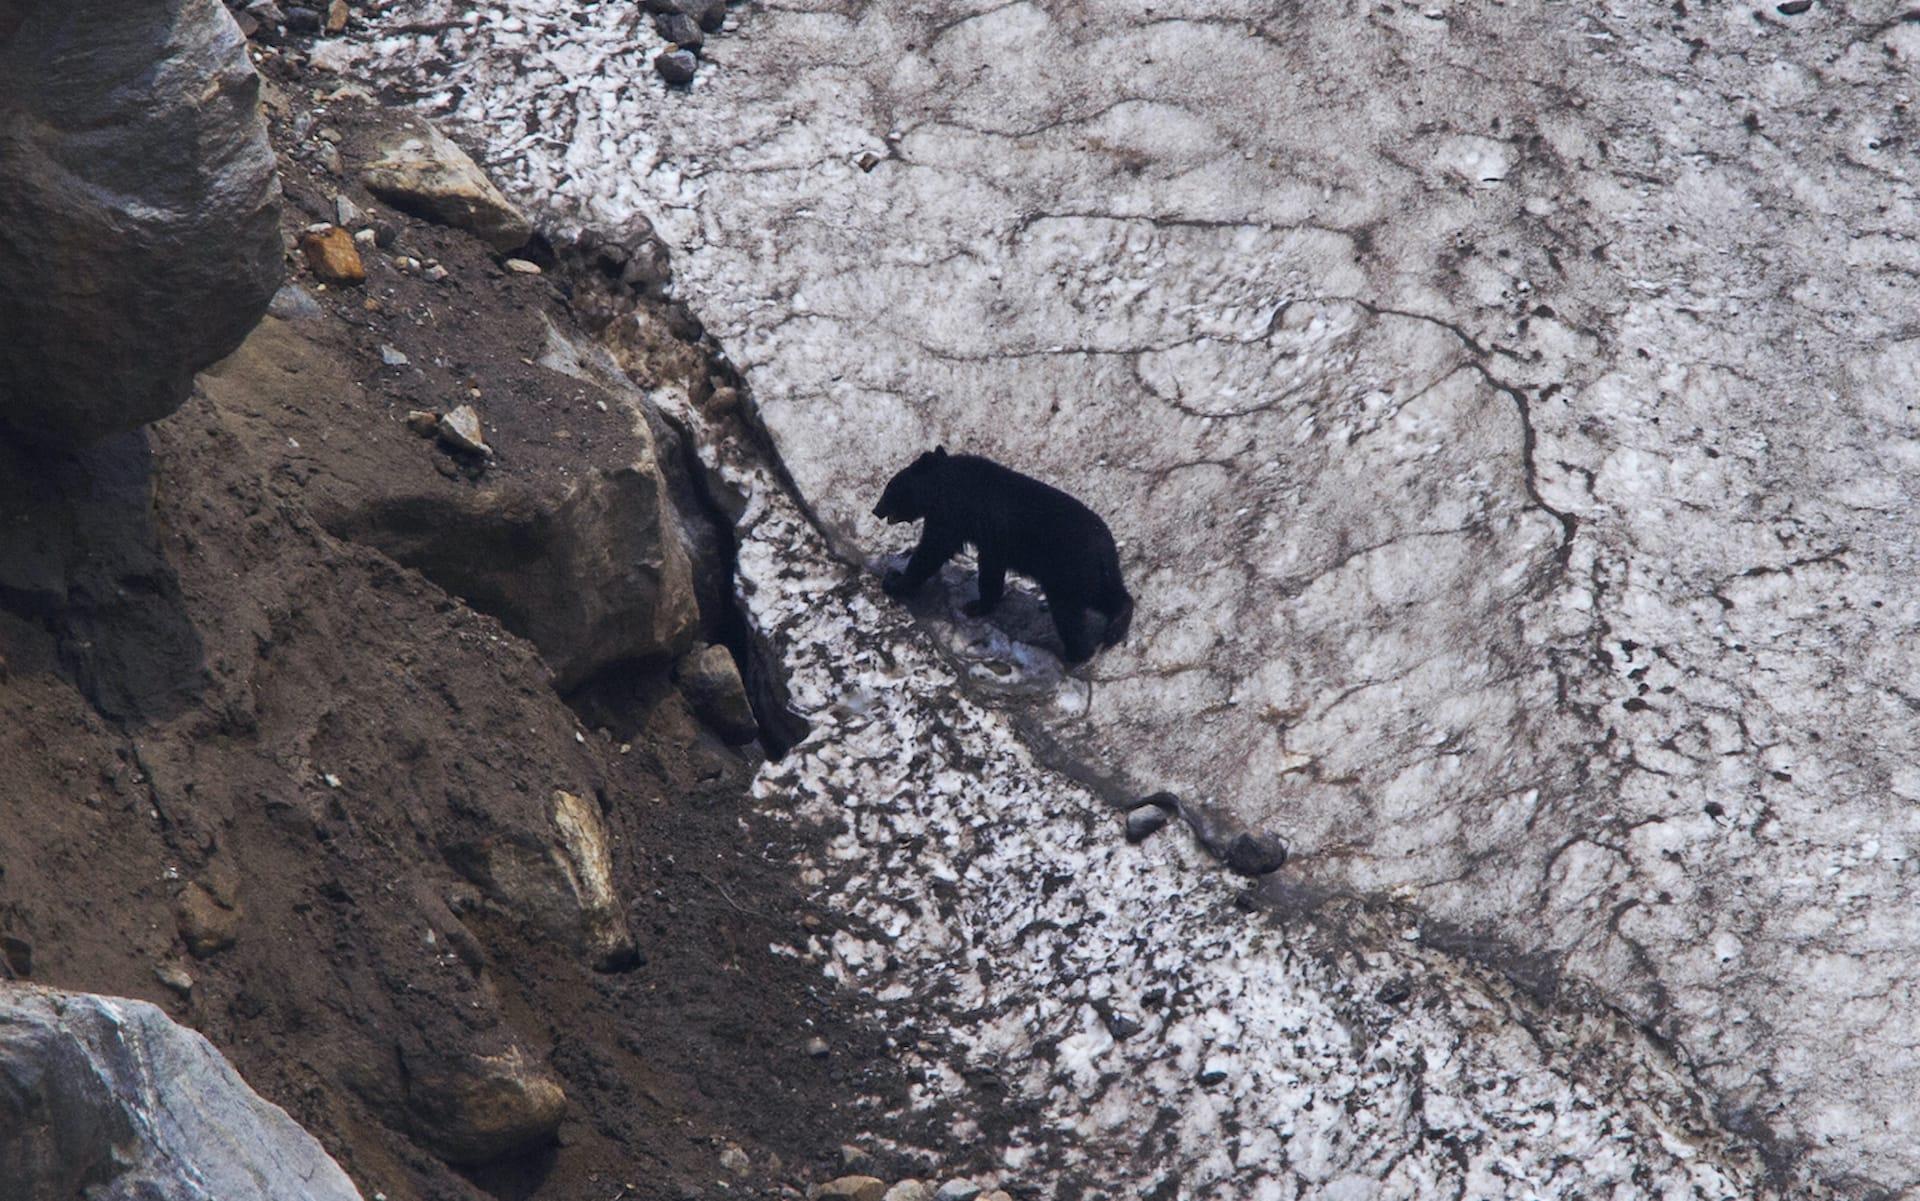 uttarakhand-bhilangna-valley-khatling-glacier-asiatic-or-himalayan-black-bear-climbing